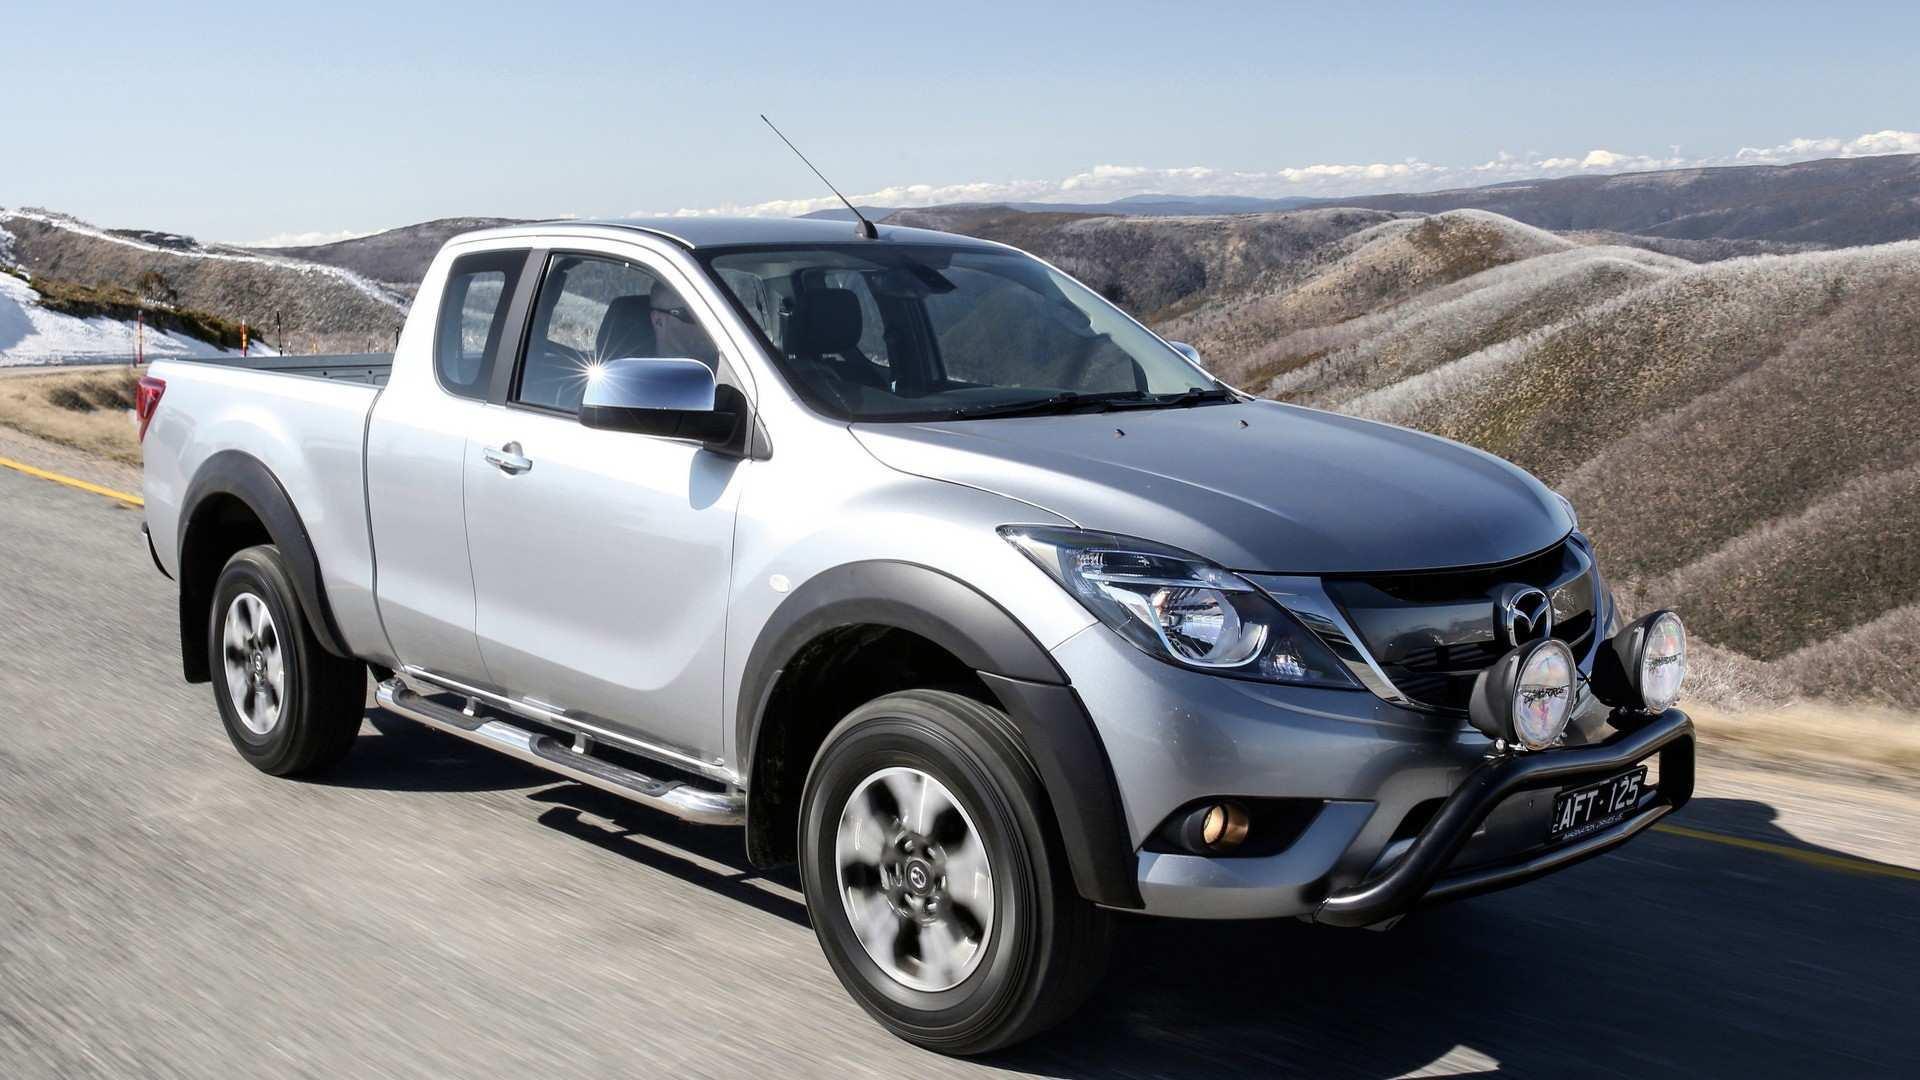 29 Great 2020 Mazda Truck Usa Pricing by 2020 Mazda Truck Usa